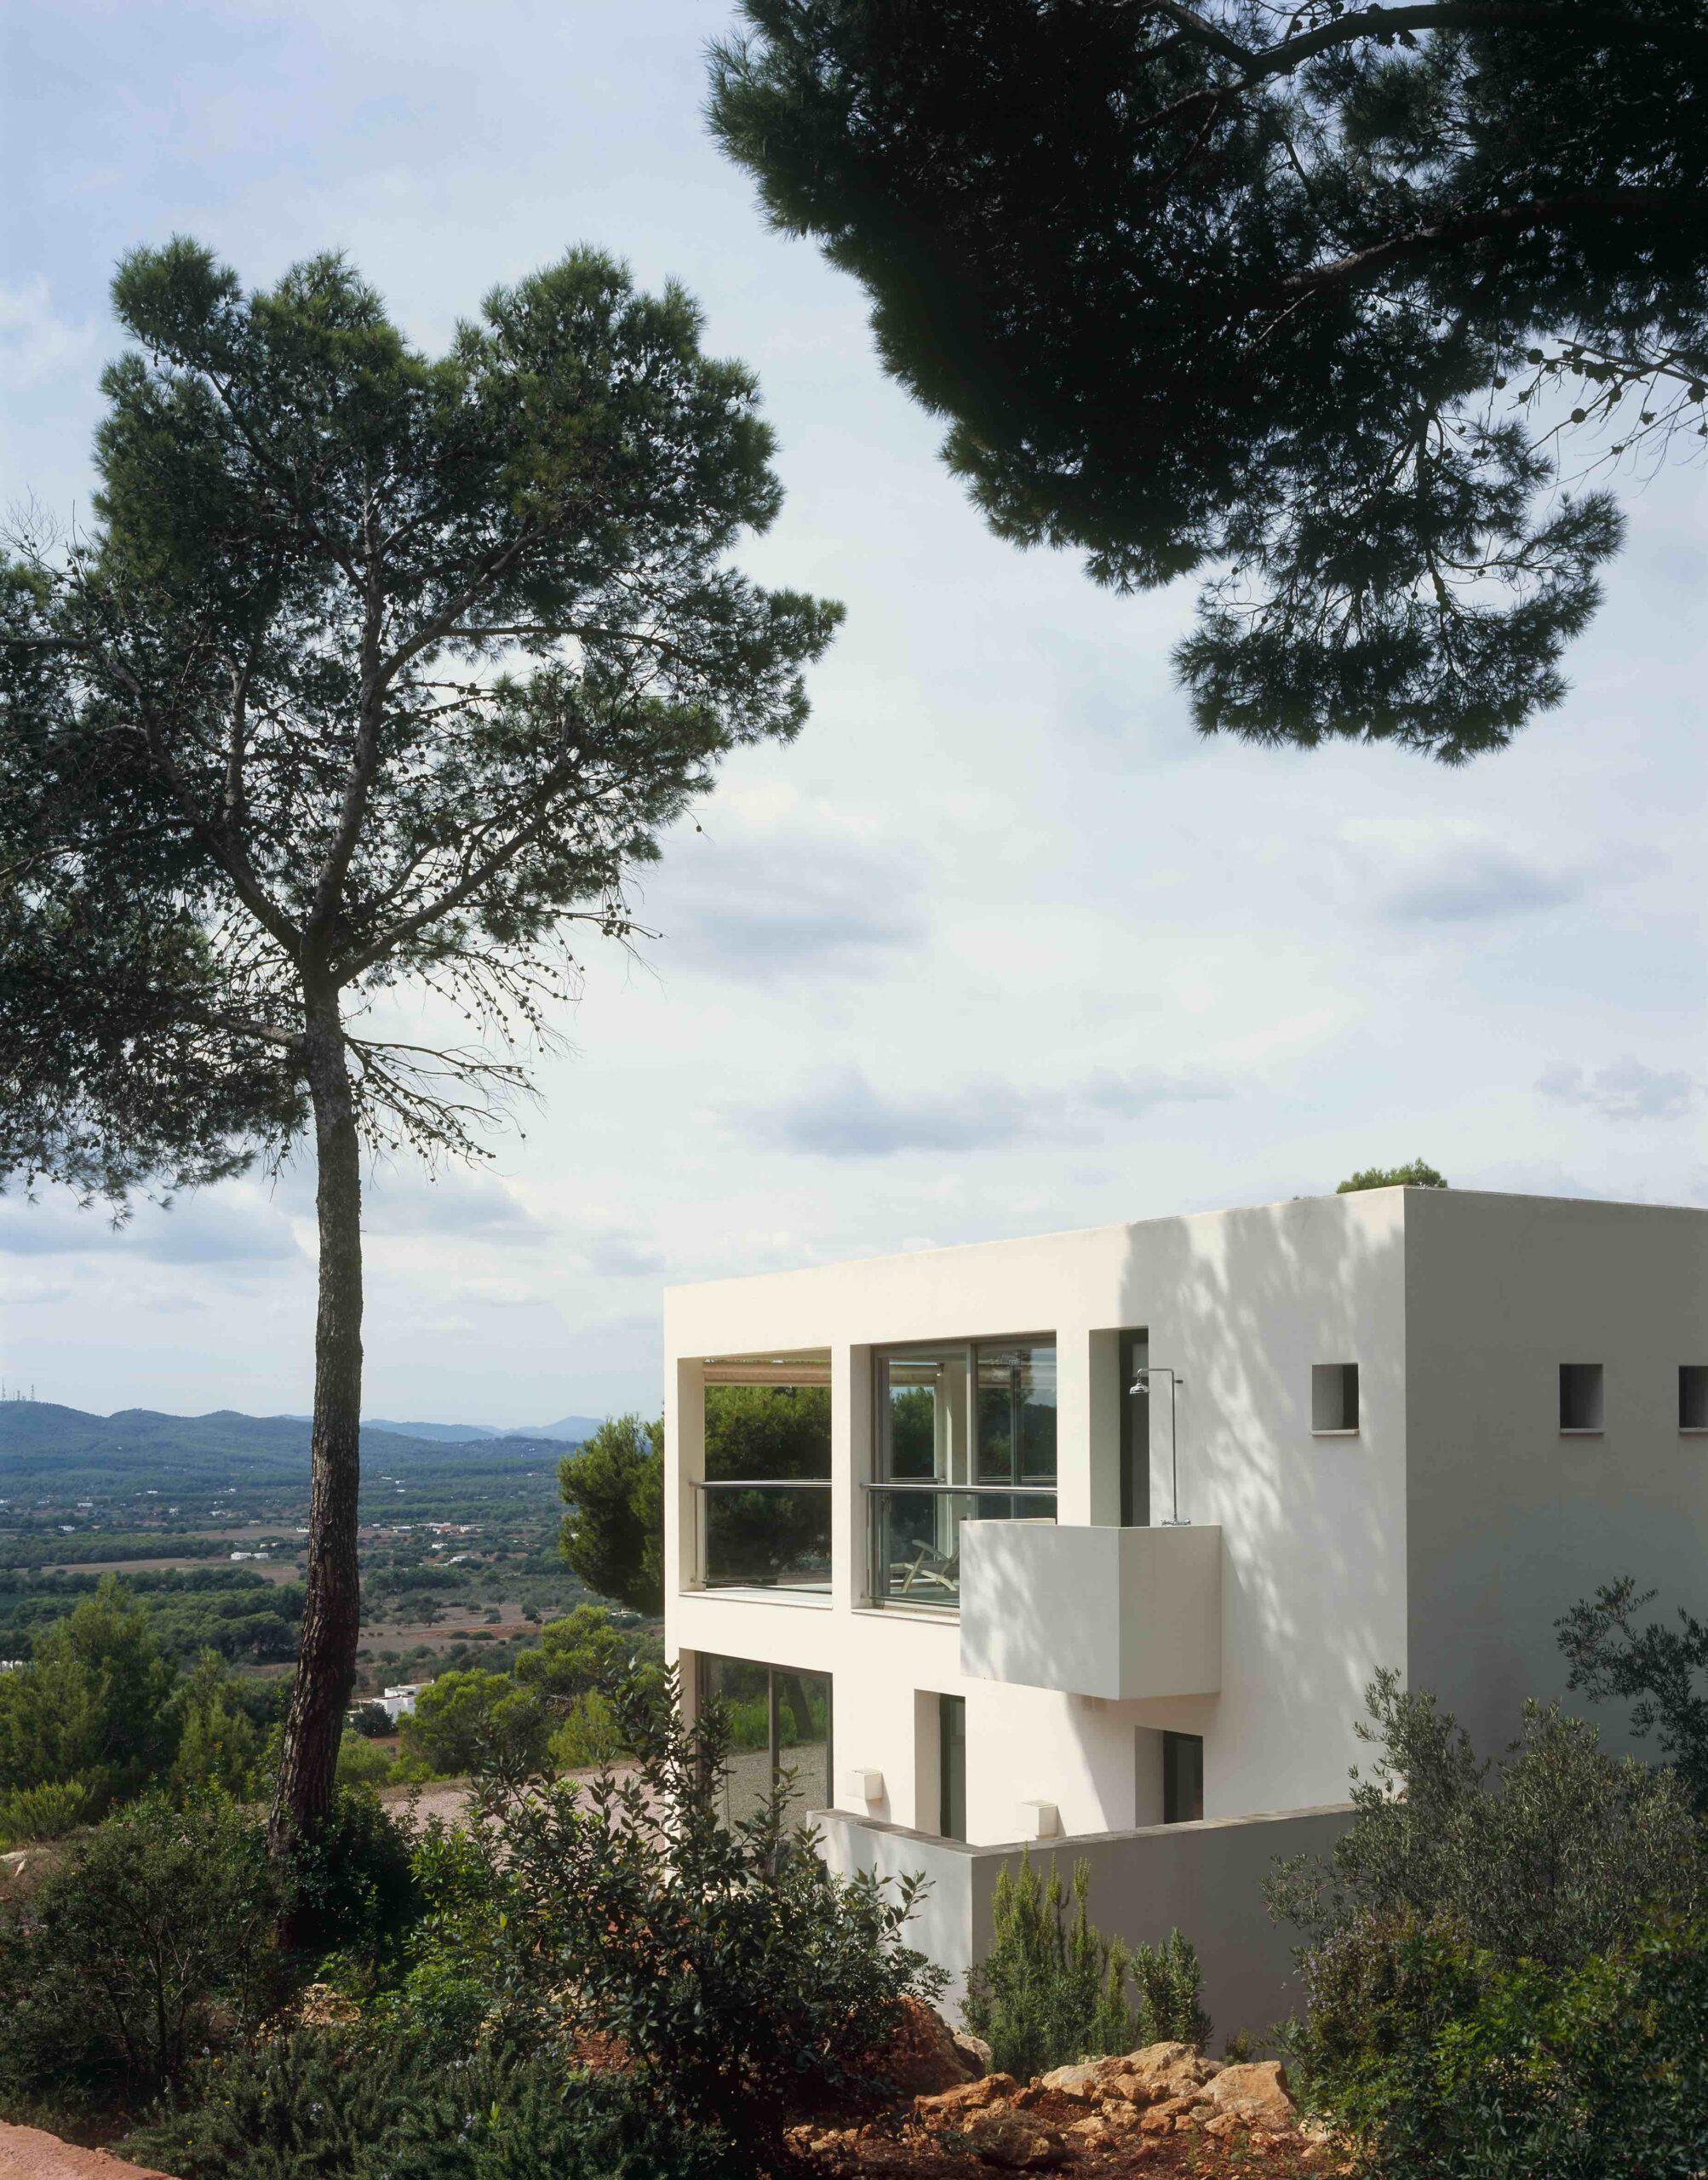 Morna Valley Ibiza 2